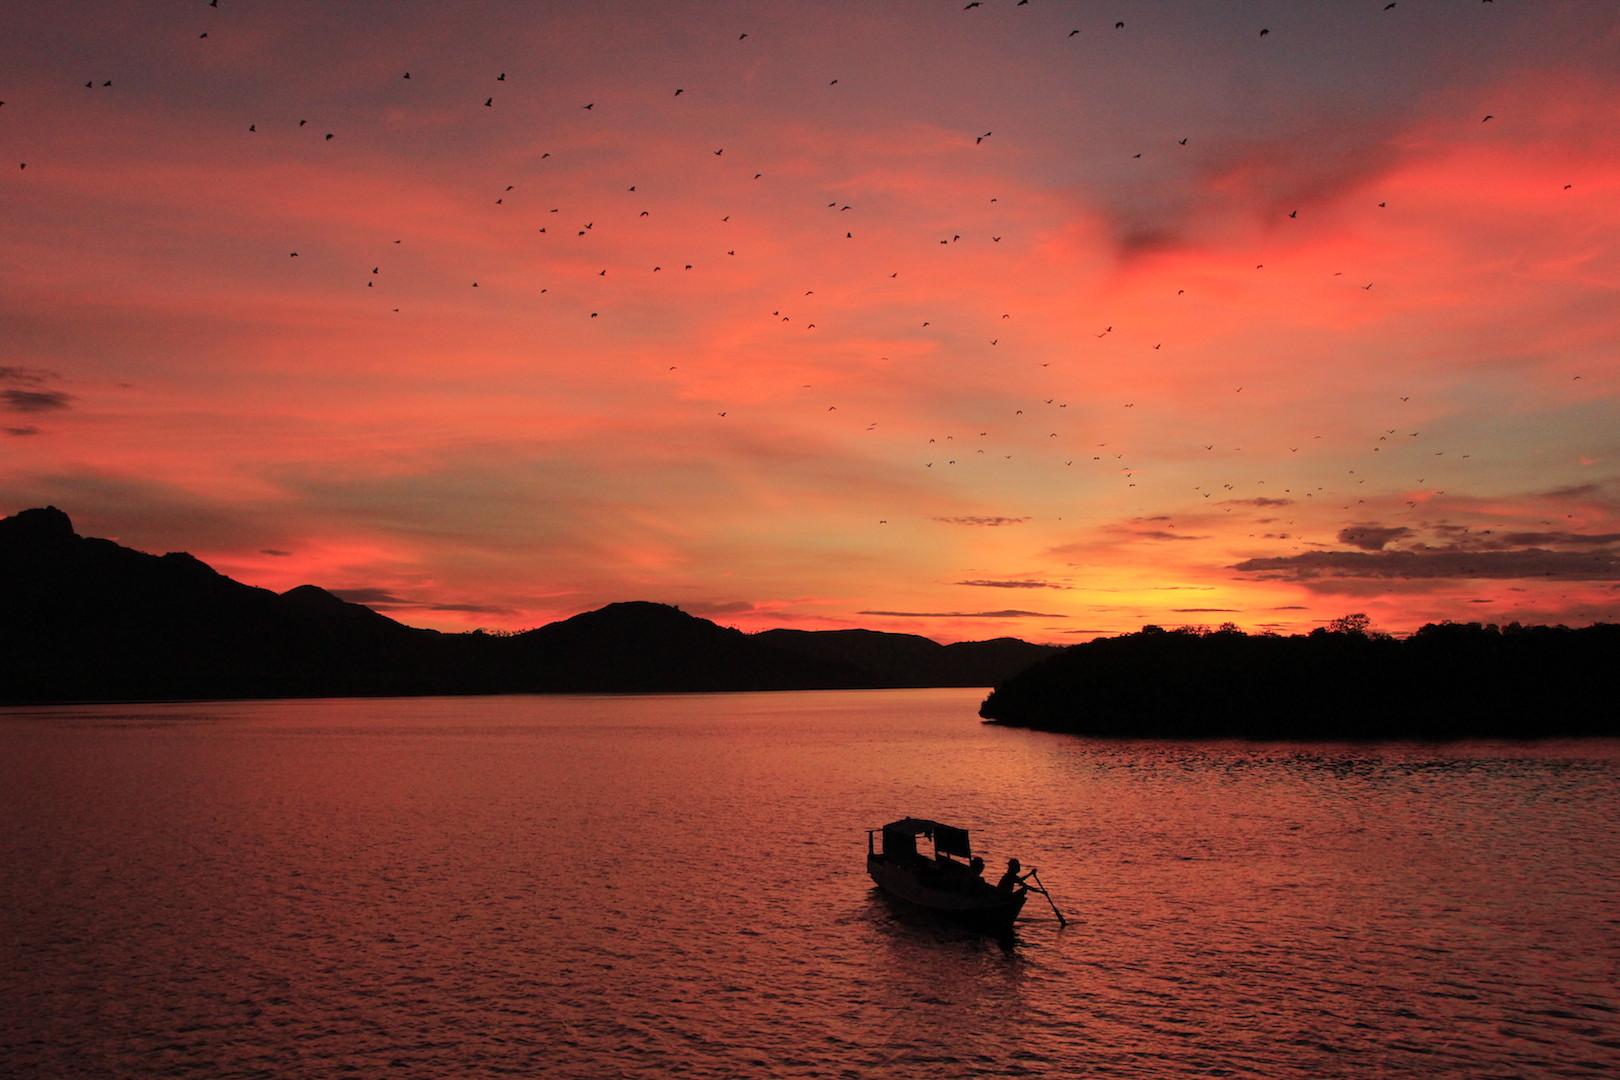 Sonnenuntergaenge in Komodo - Indonesia